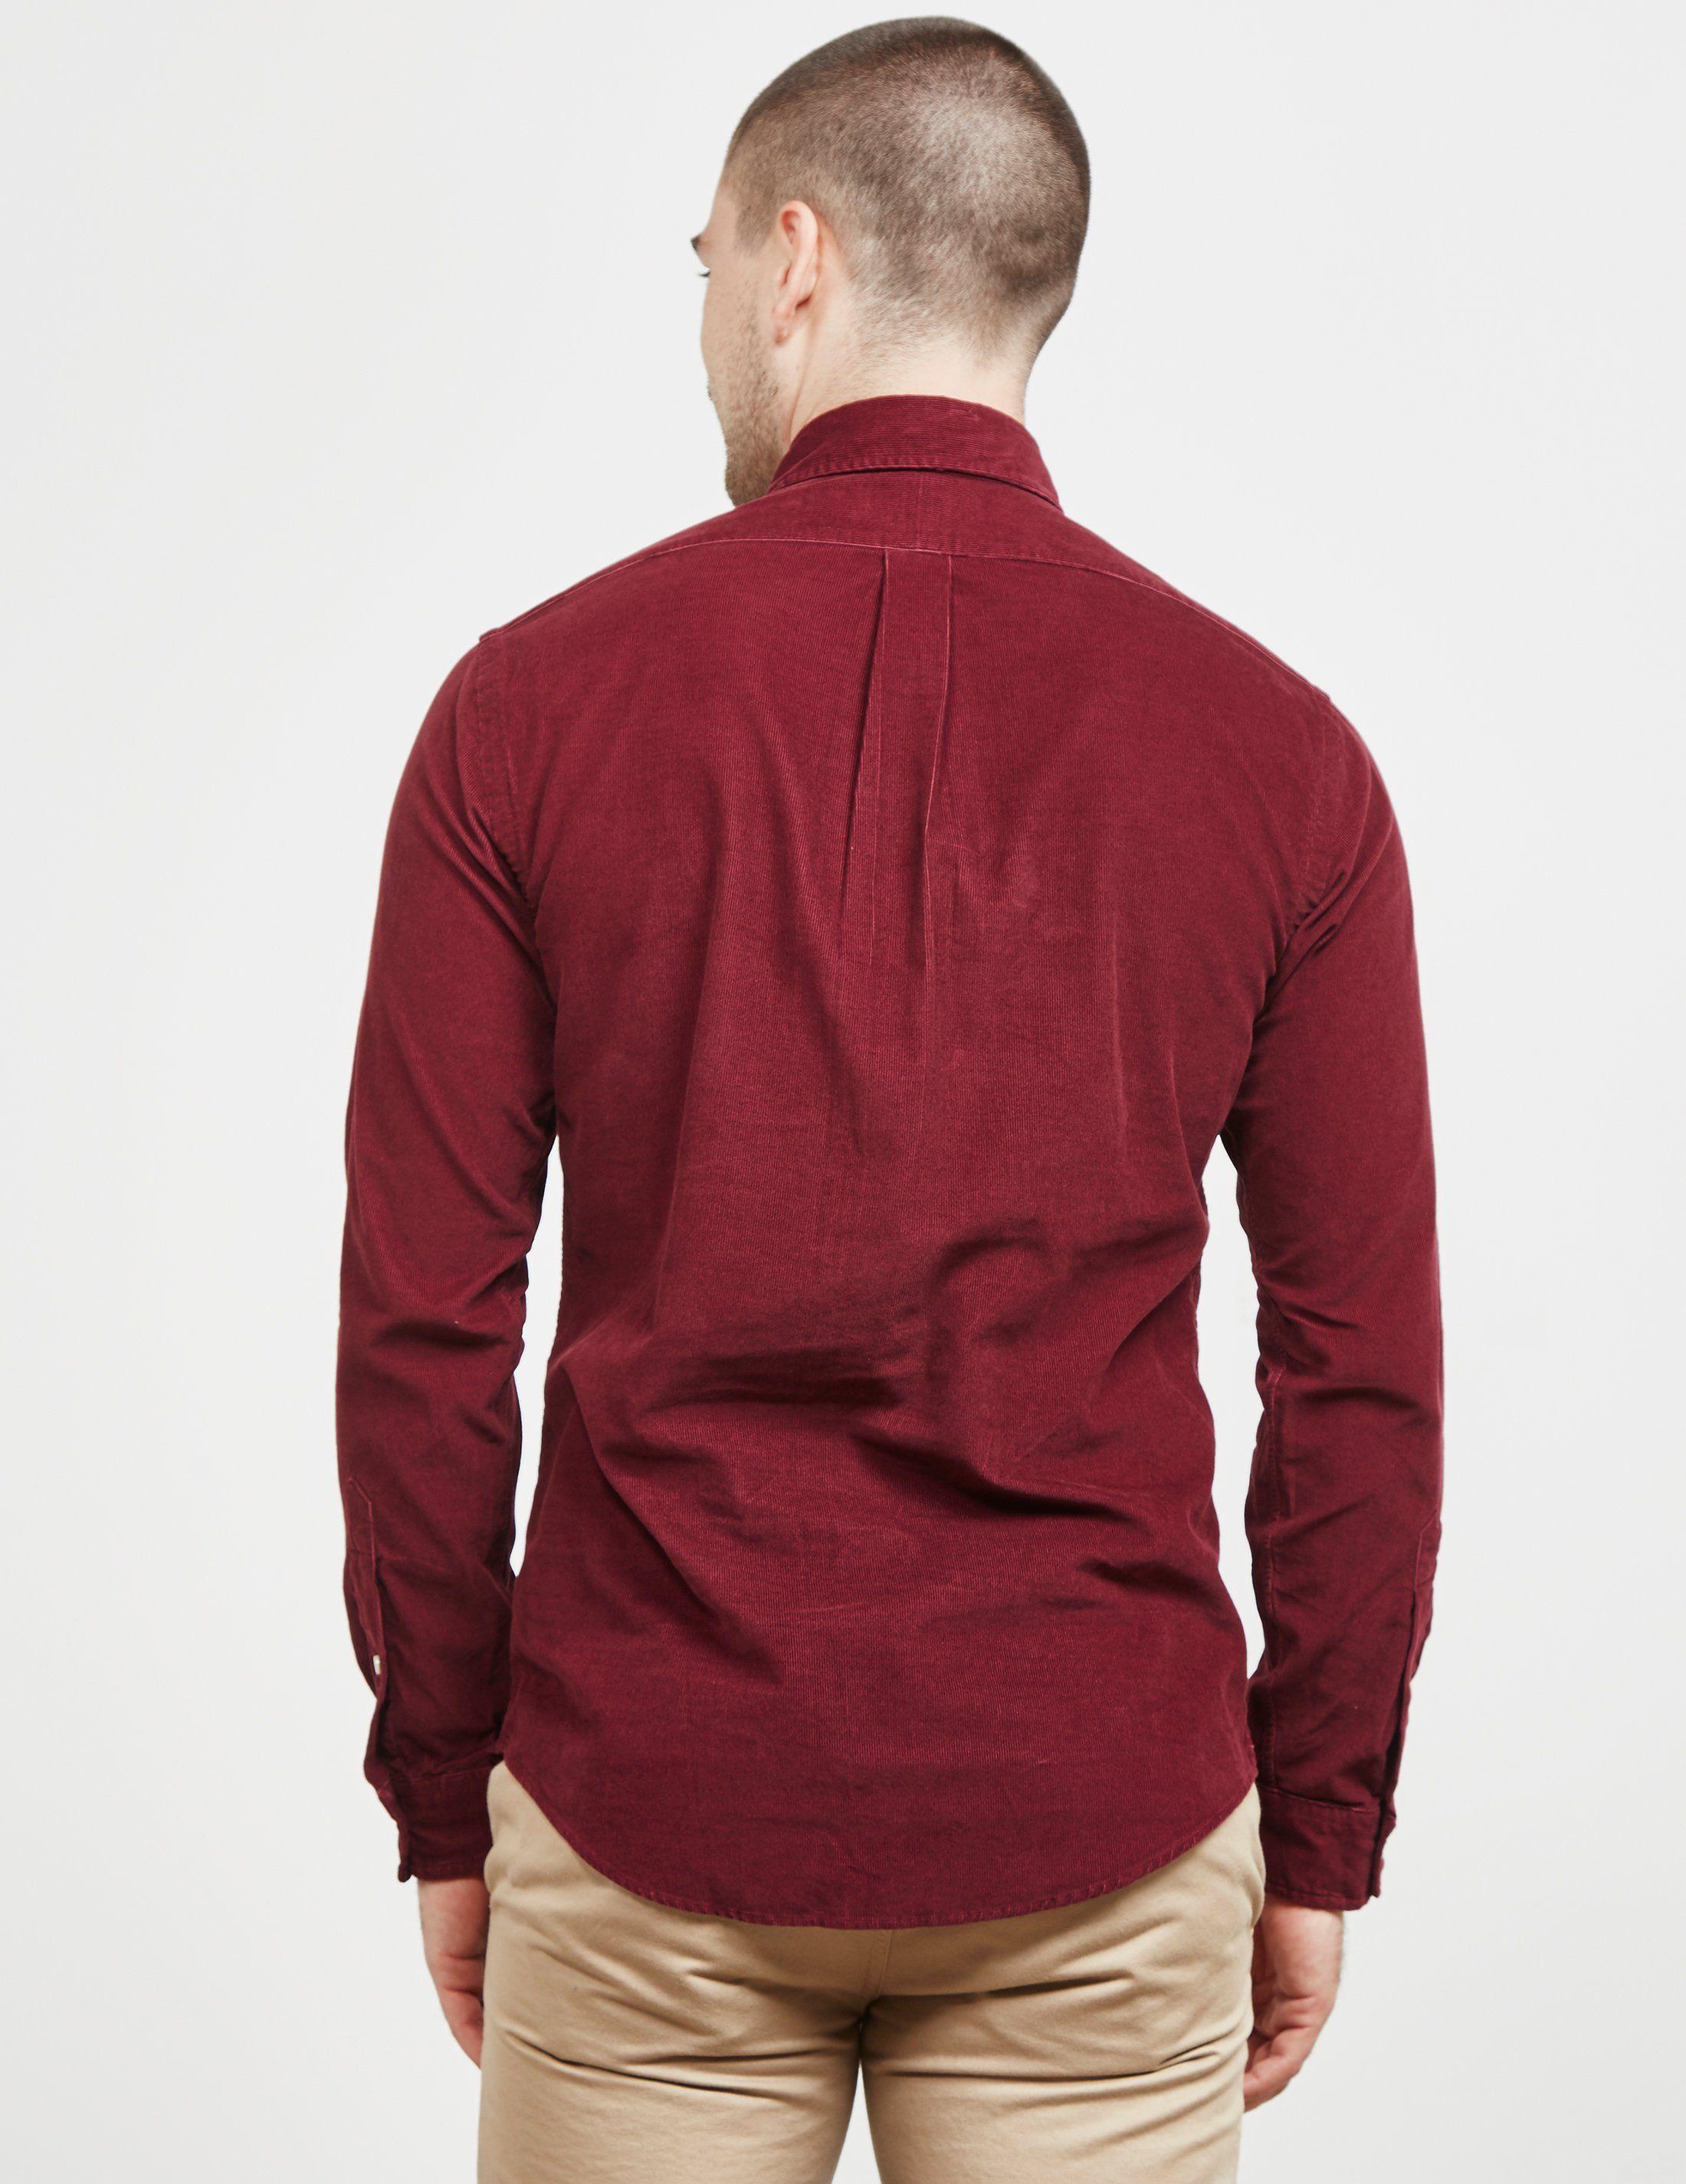 Polo Ralph Lauren Cord Slim Fit Long Sleeve Shirt